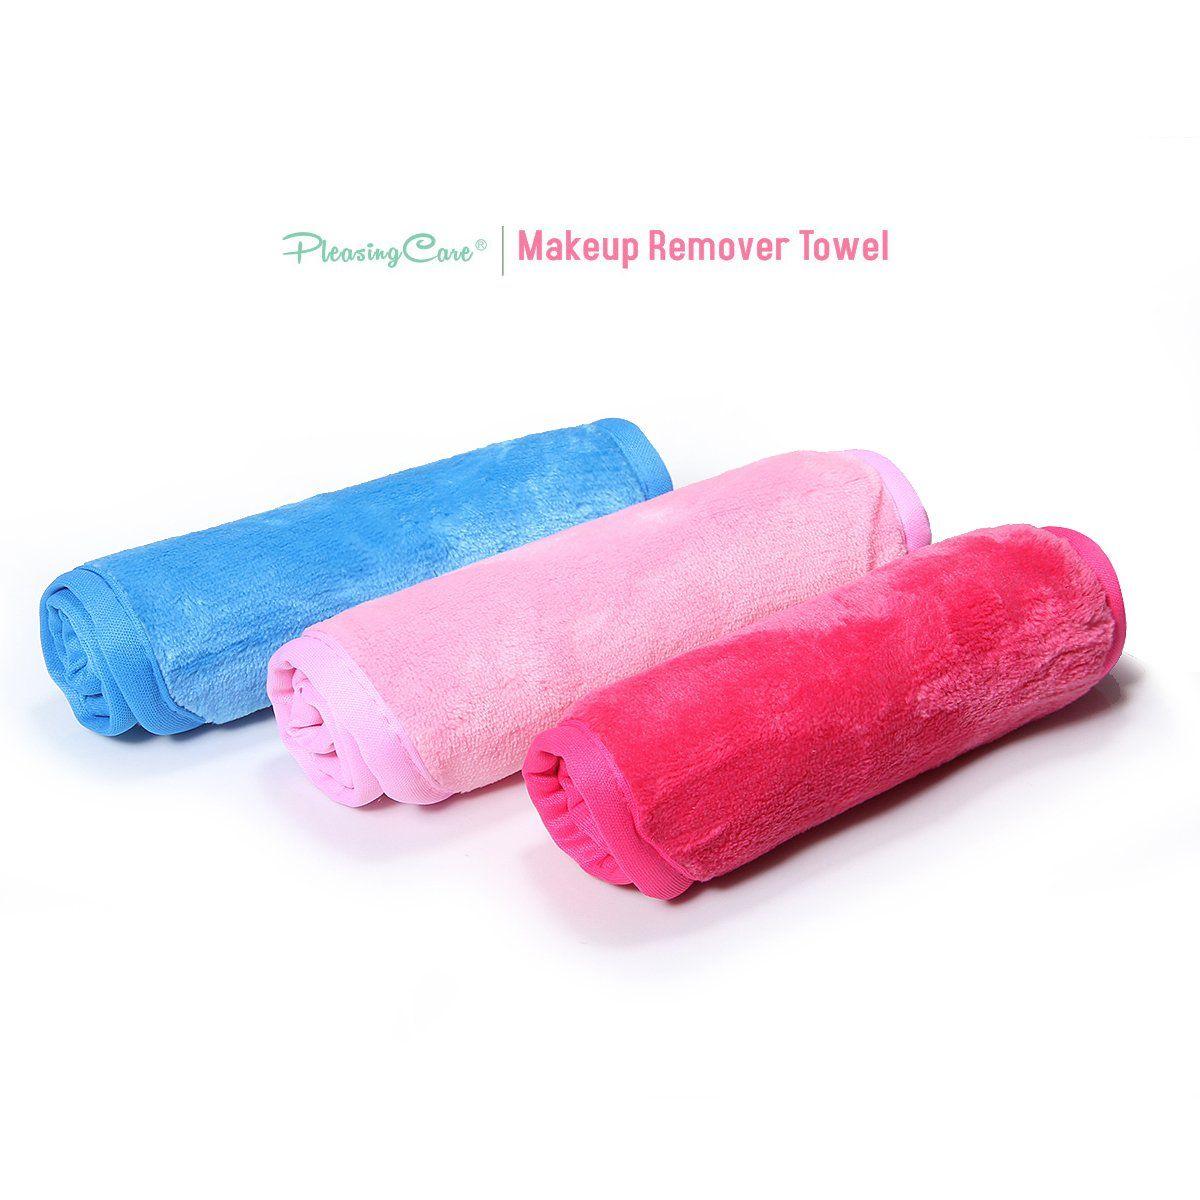 Makeup Remover Cloth Clean Towel Reusable Facial Cleansing